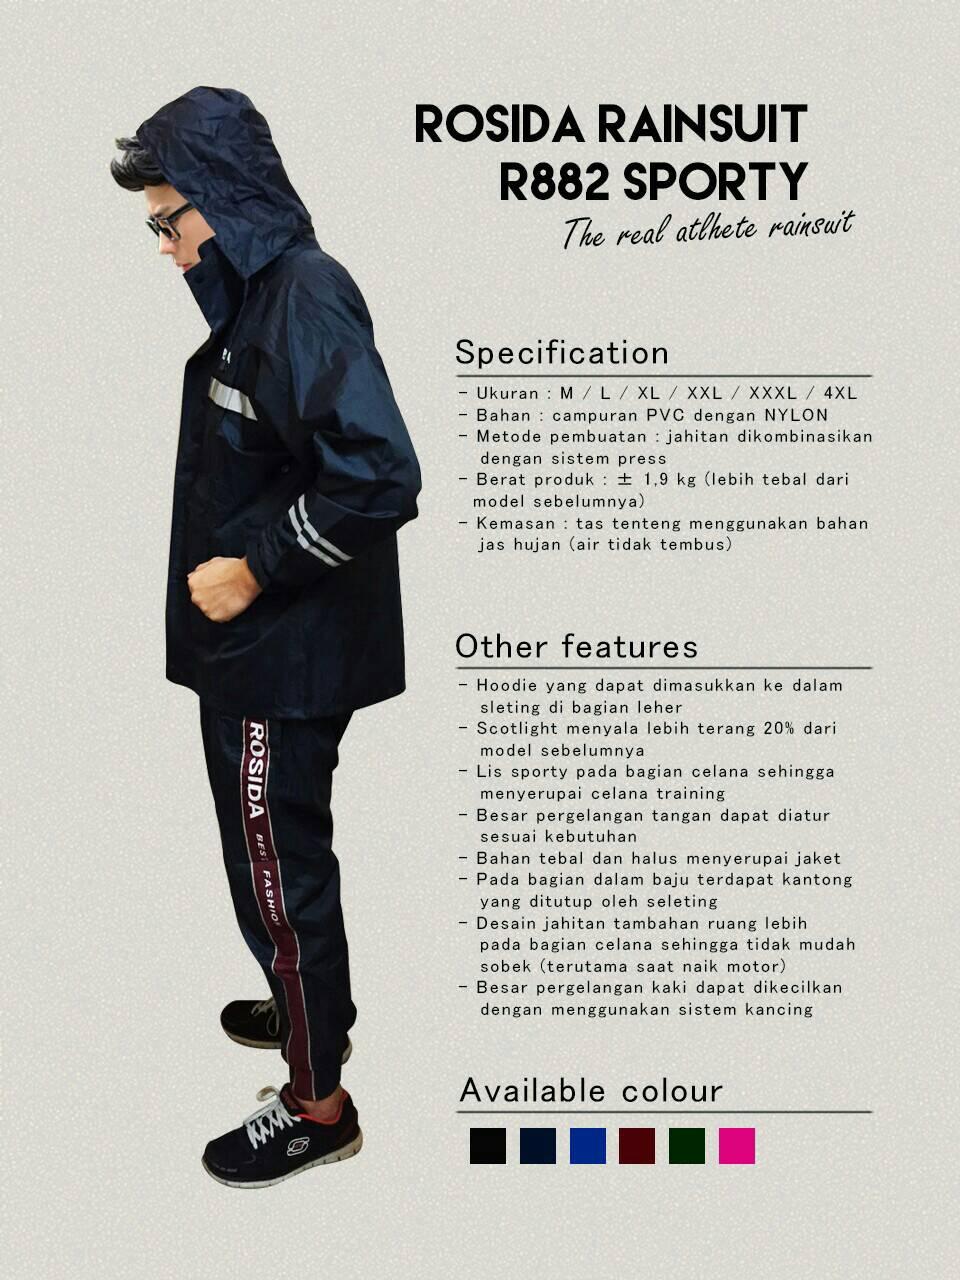 Harga Jas Hujan Rosida Sporty 882 Best Fashion 2016